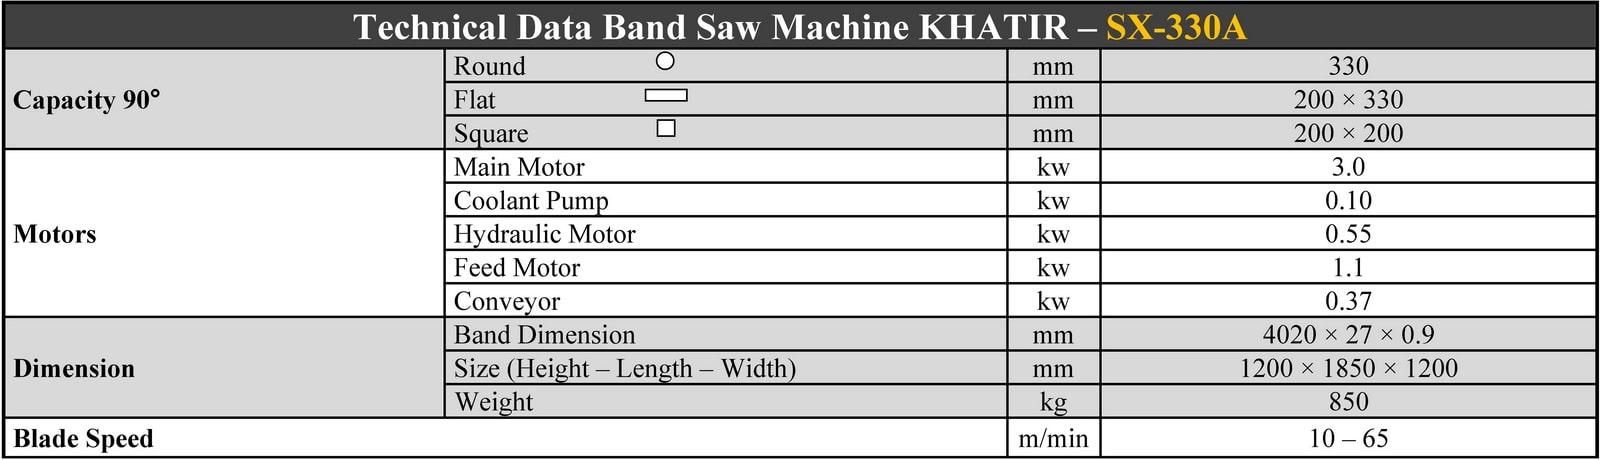 SX 330A - مشخصات فنی دستگاه اره نواری بازویی تمام اتوماتیک خطیر